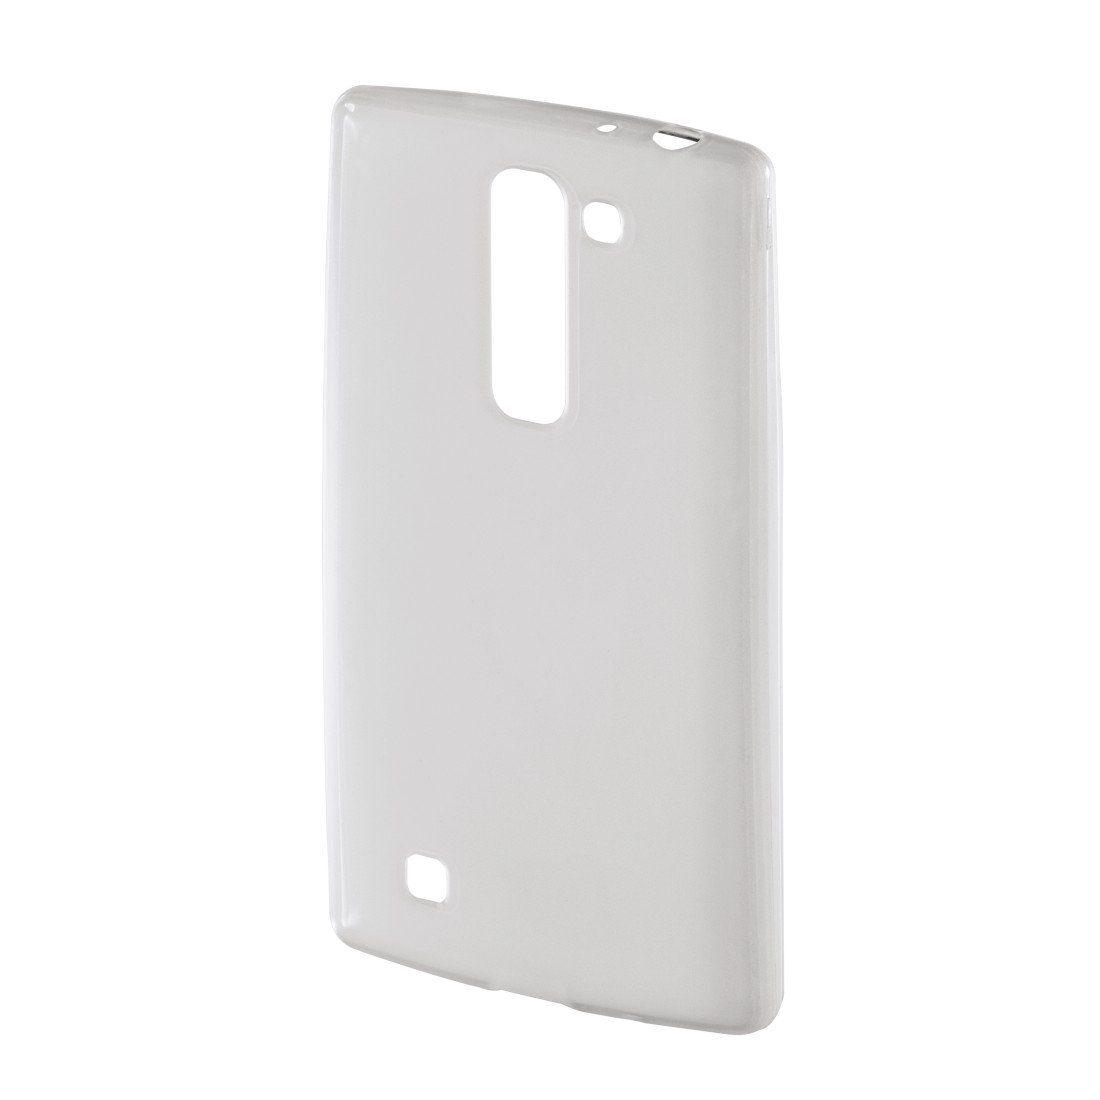 Hama Cover Crystal für LG Magna/LG G4c, Transparent